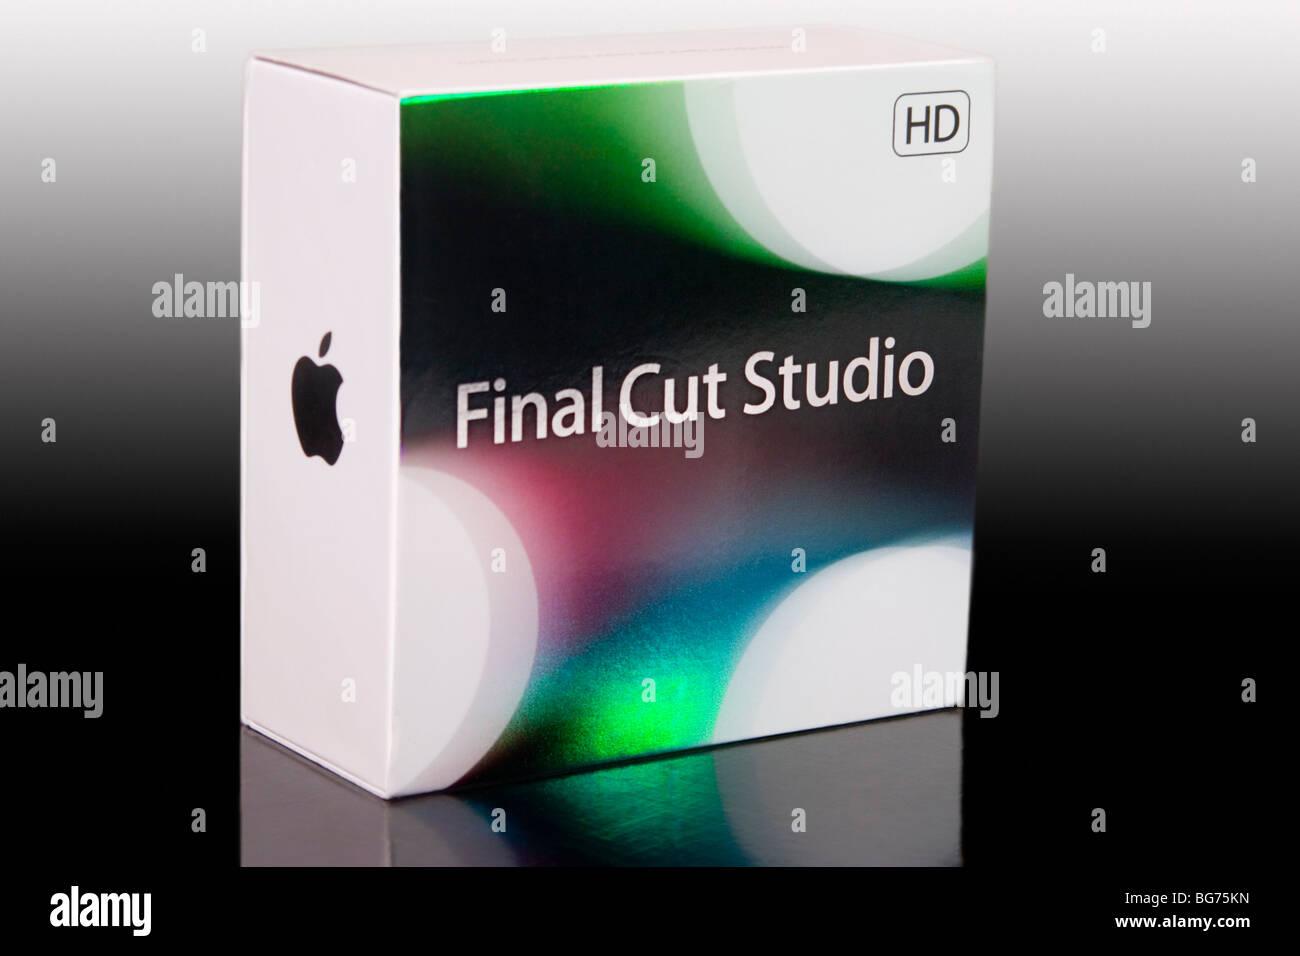 apple final cut studio video editing software stock photo rh alamy com Final Cut Pro X Final Cut Studio Icon